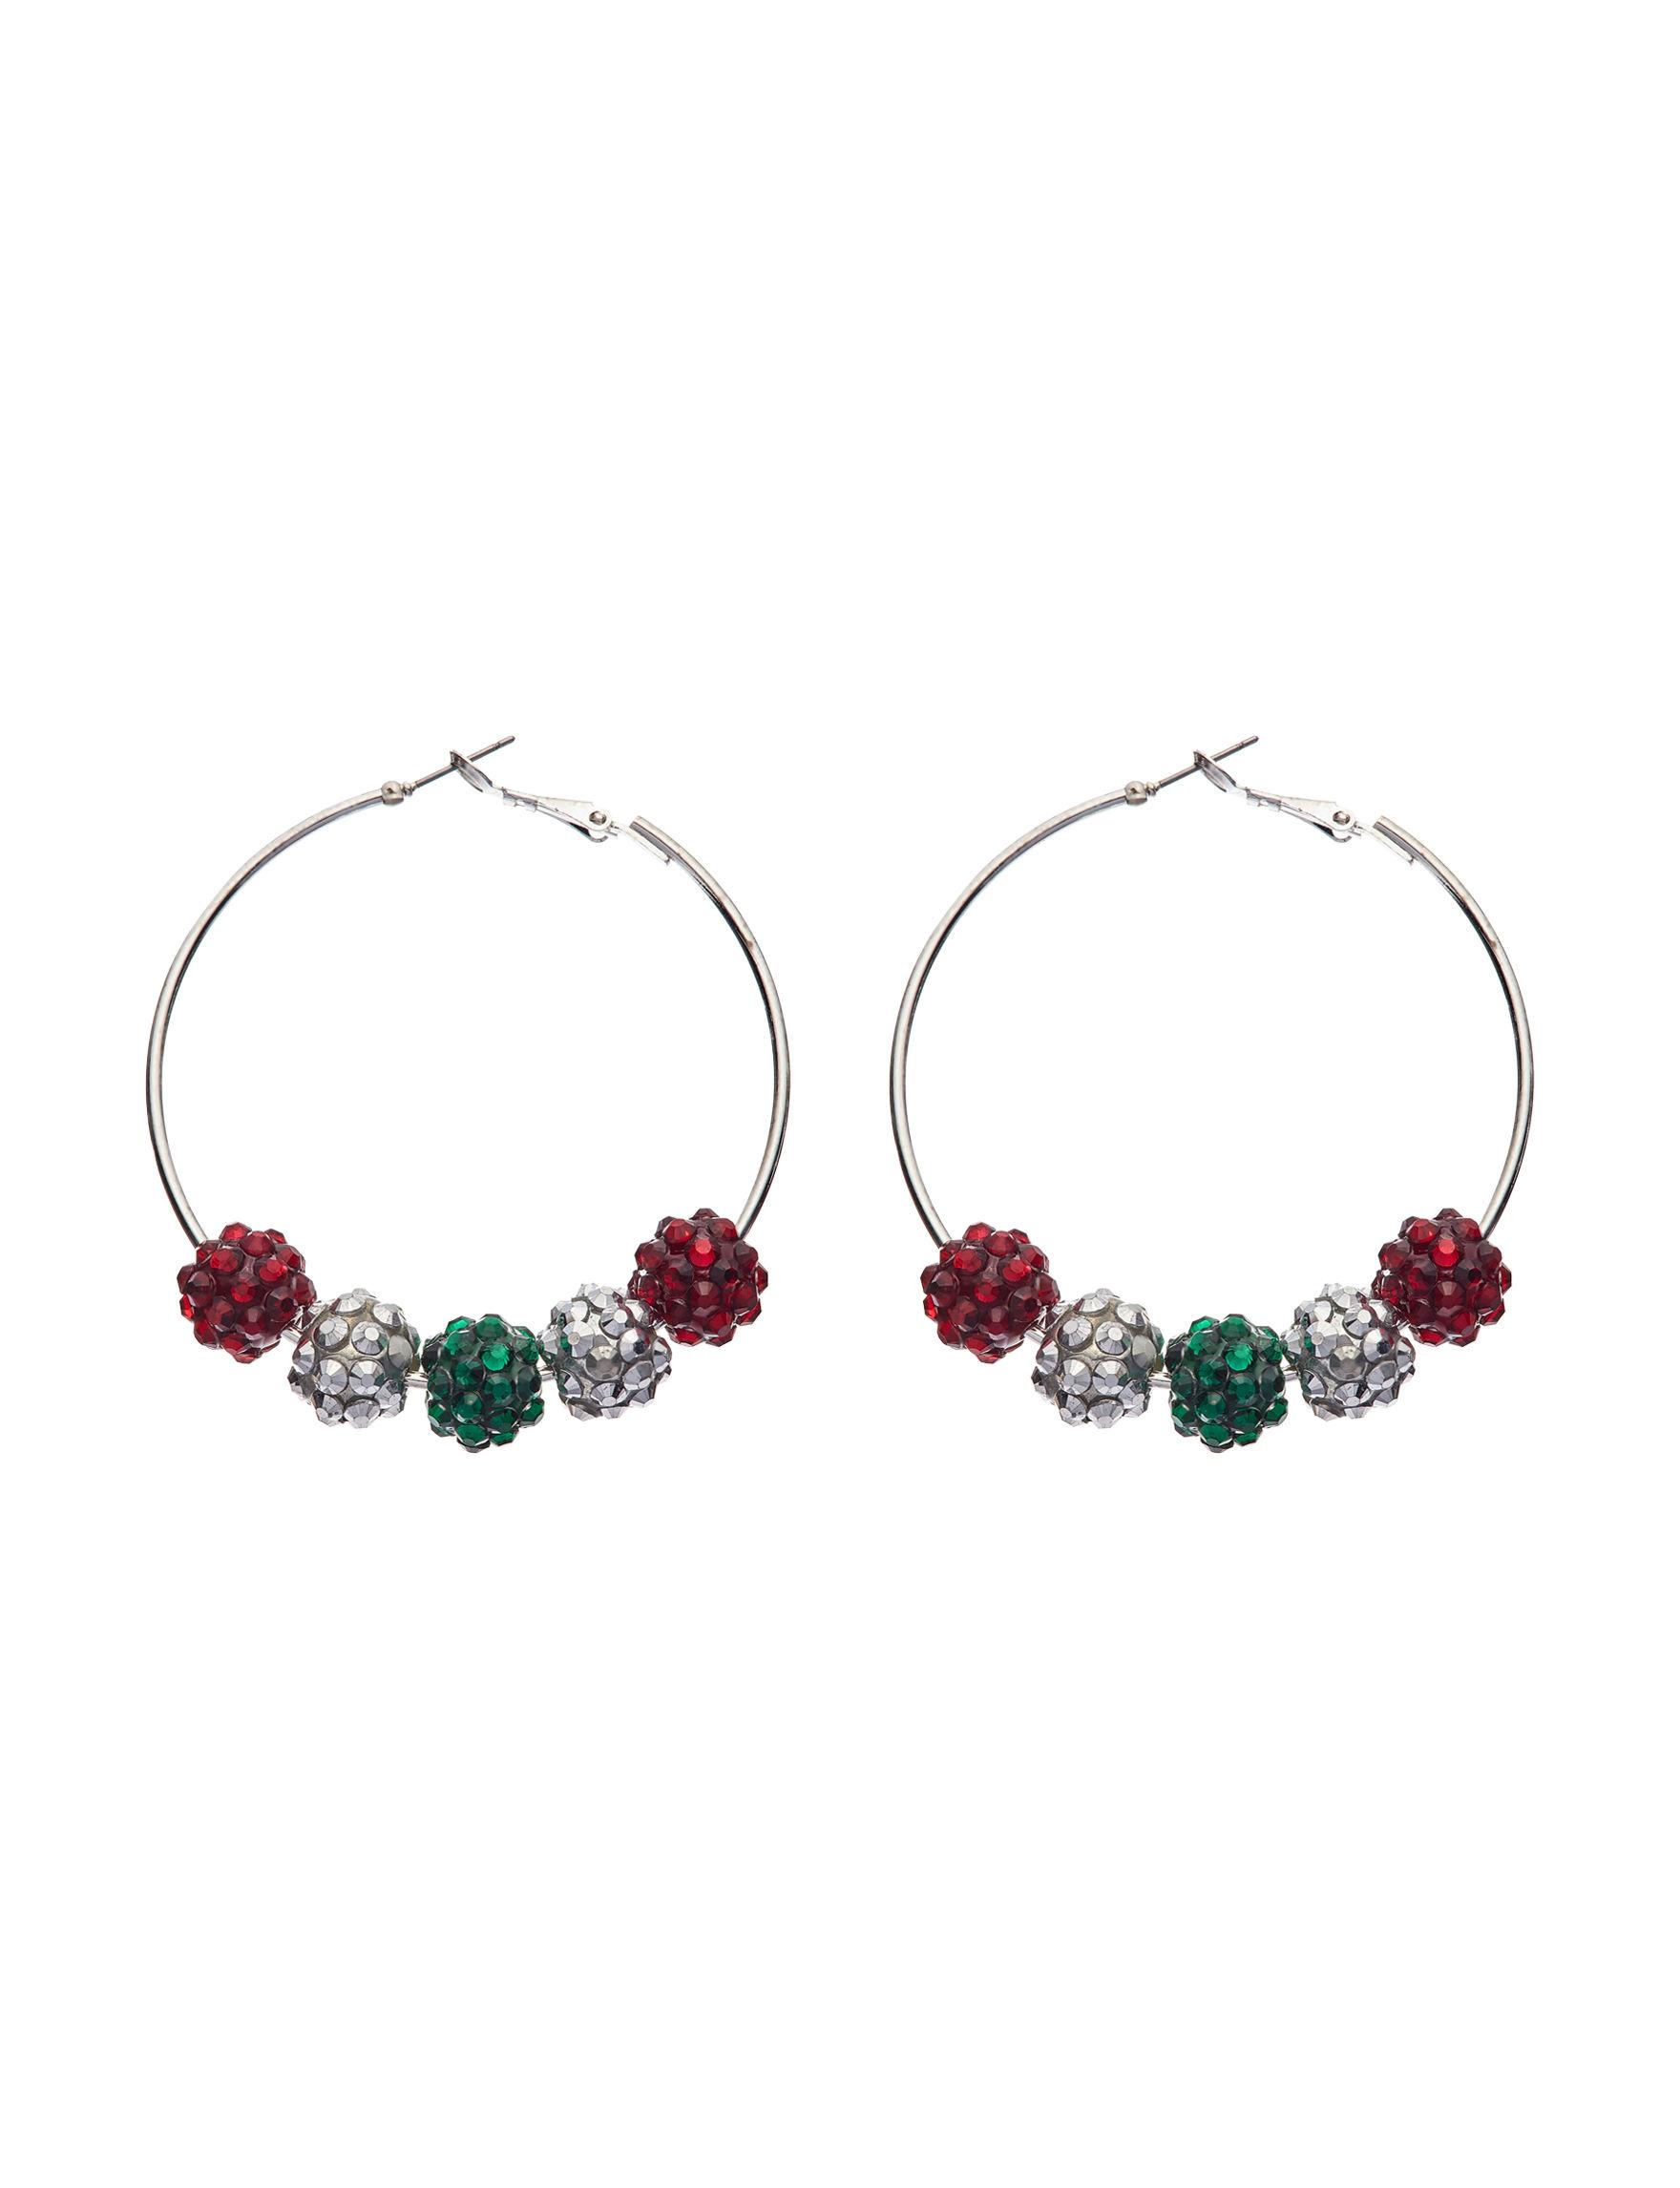 Hannah Multi Color Hoops Earrings Fashion Jewelry